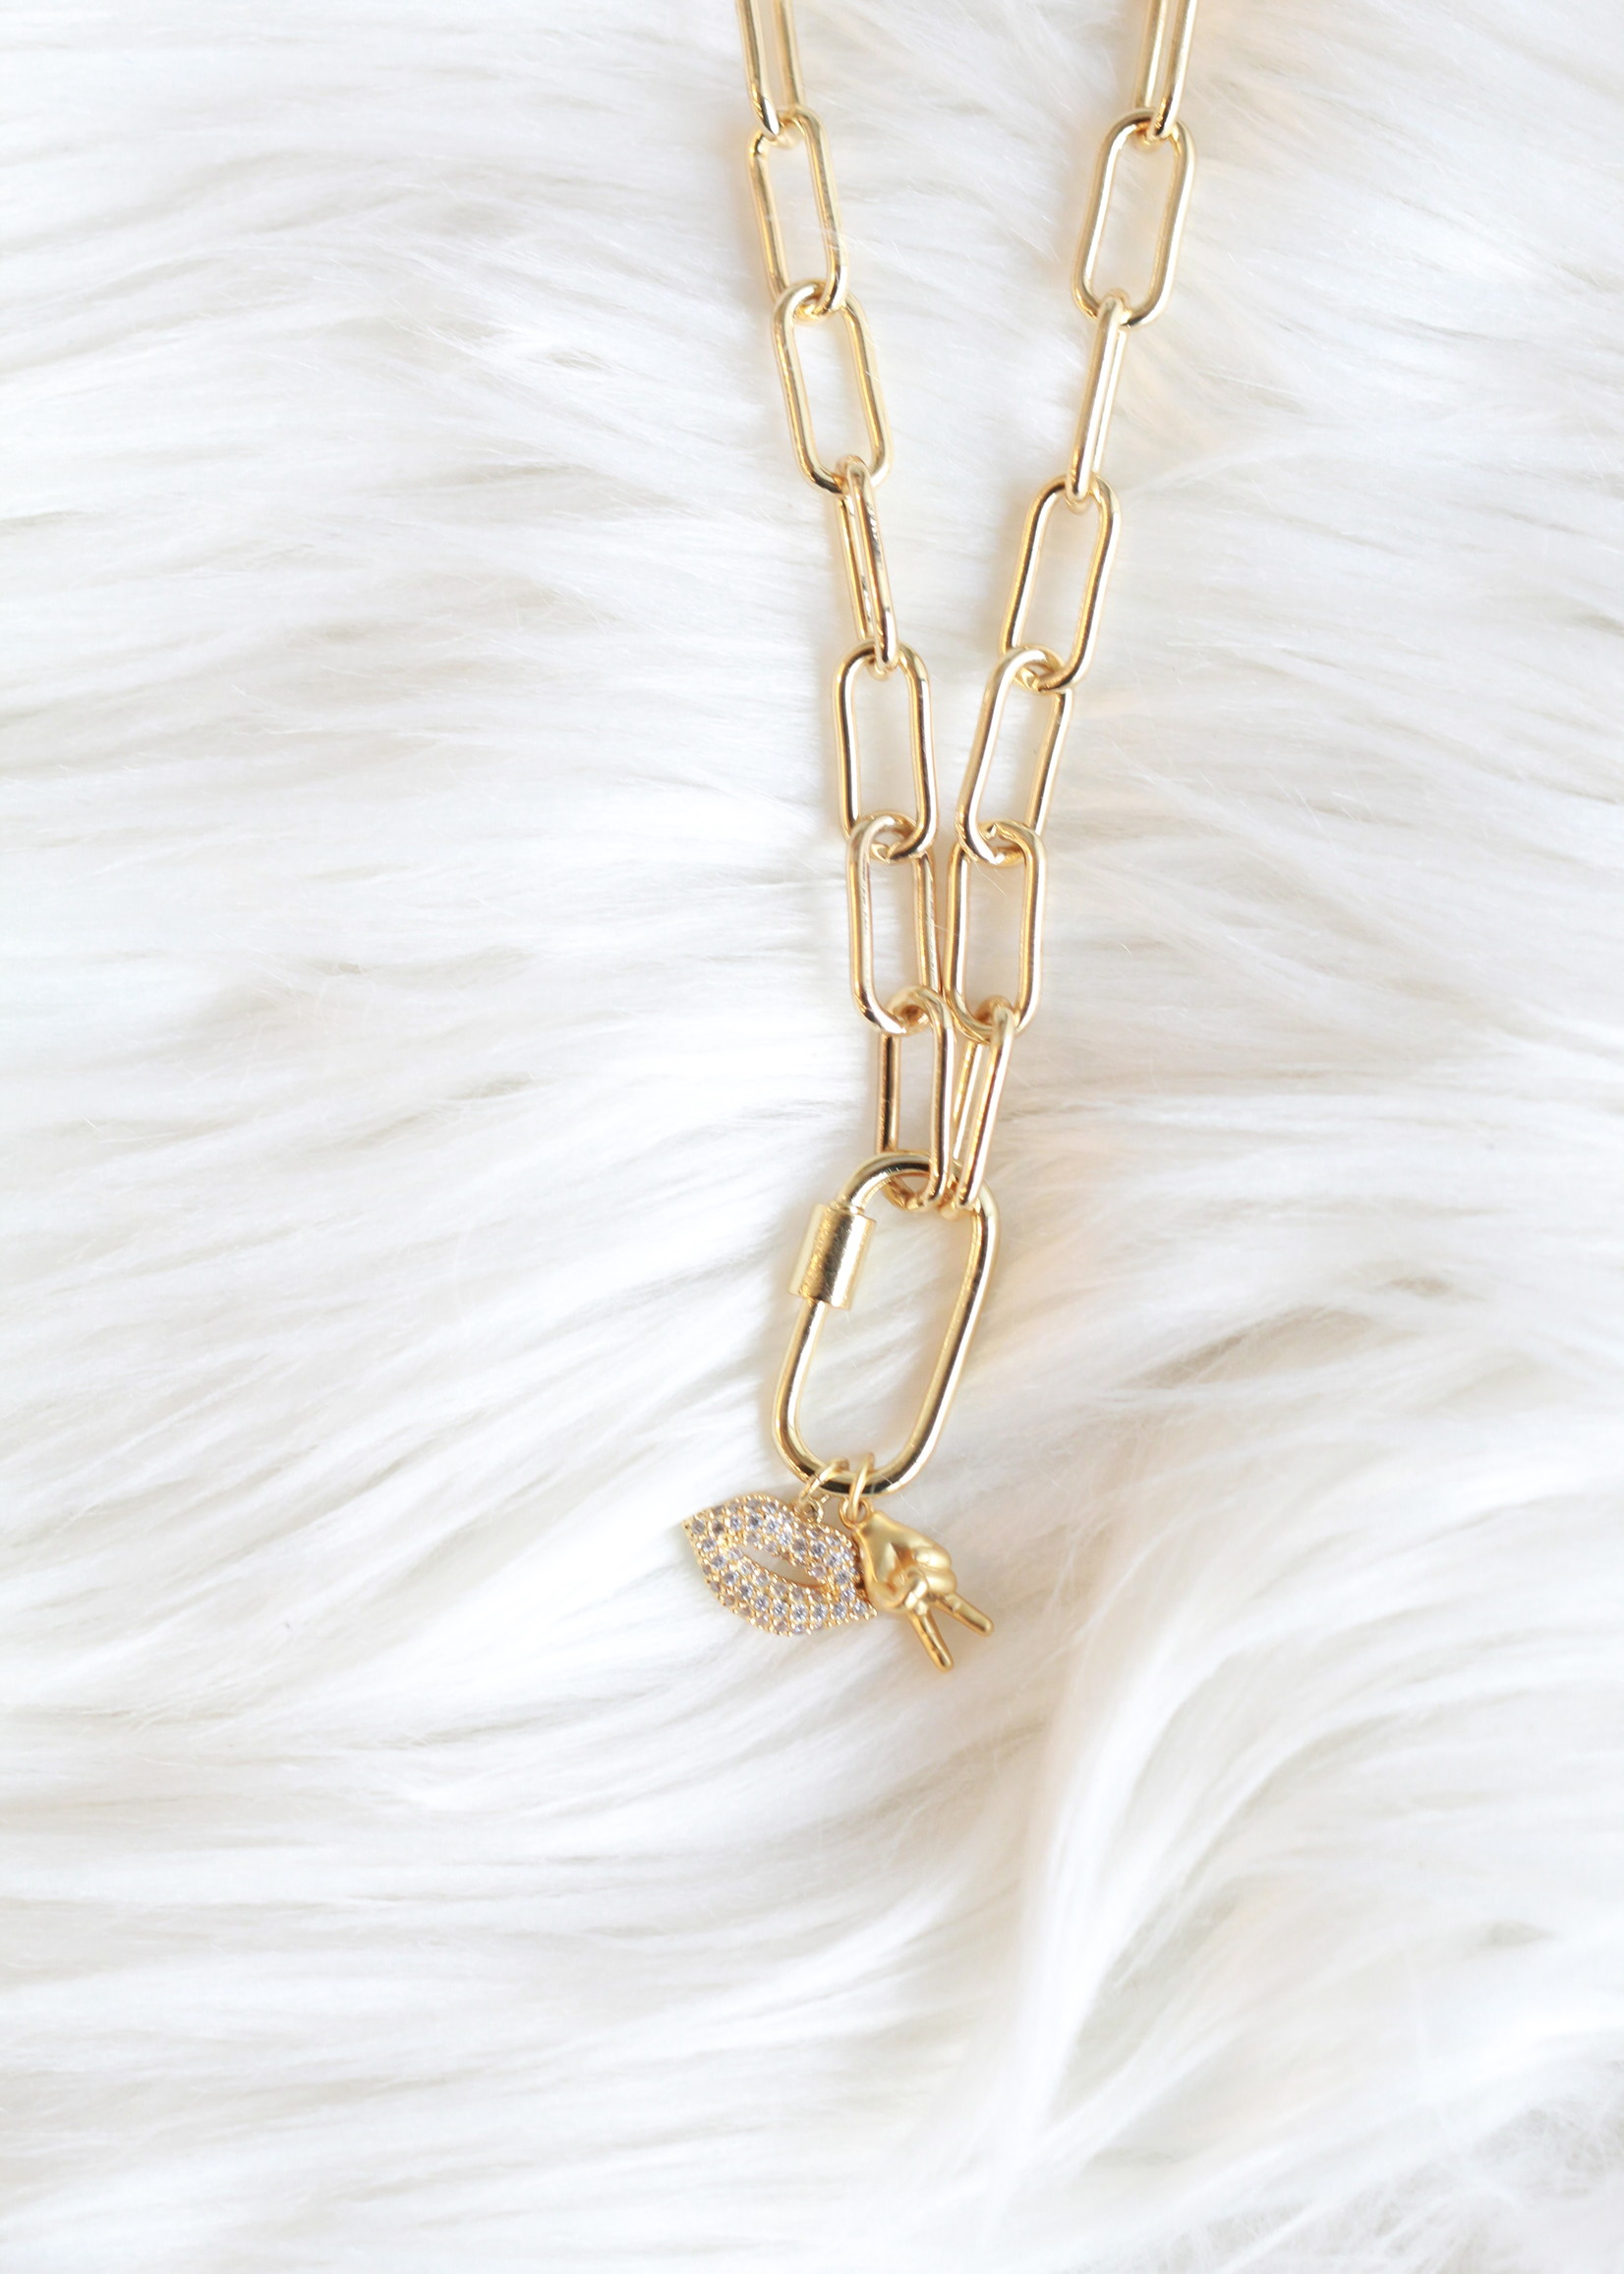 Bofemme Femme Kiss Charm Necklace